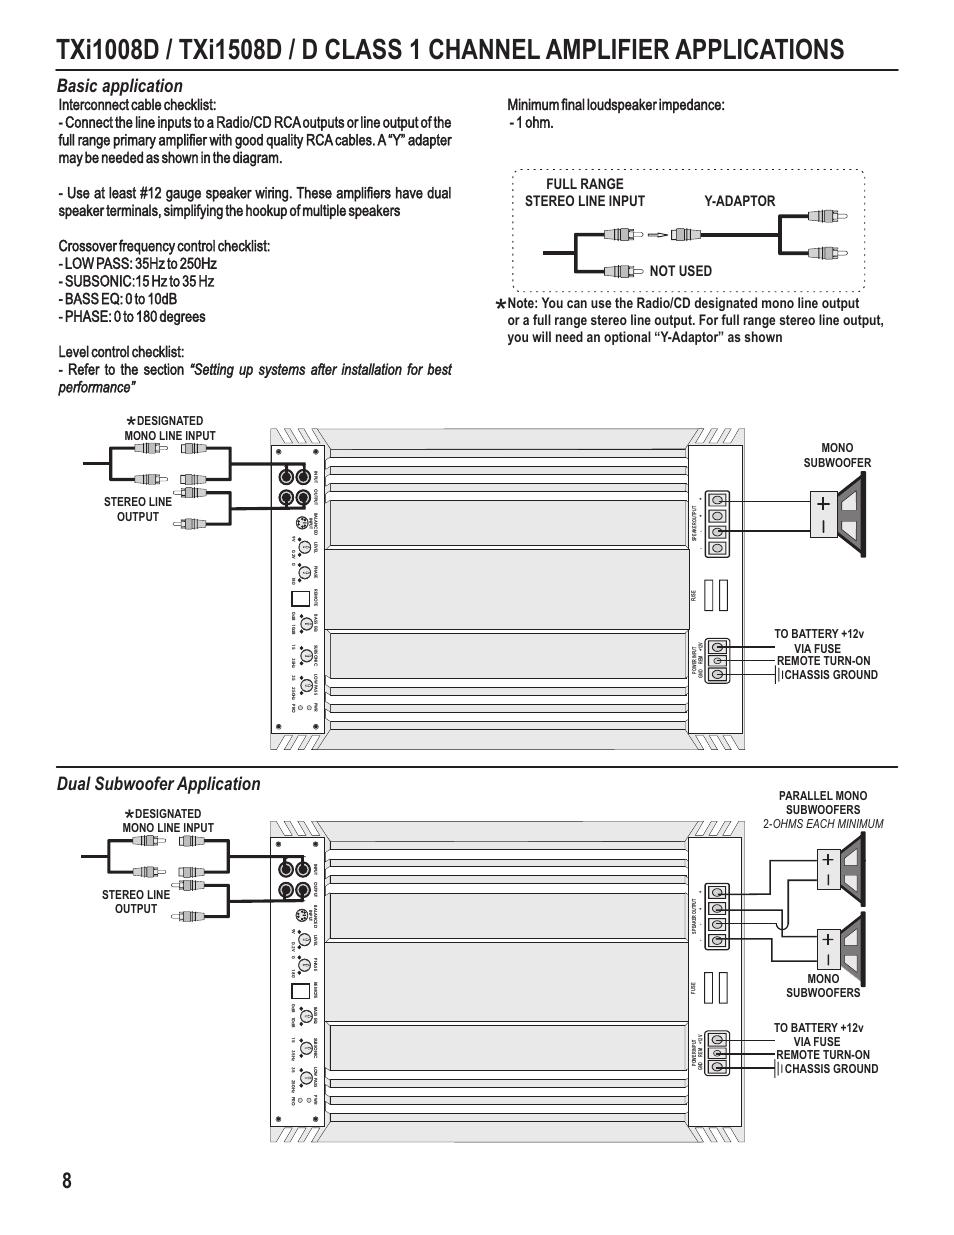 Basic application, Dual subwoofer application, Remote turn-on | Maxxsonics  Hifonics TXi4408 User Manual | Page 10 / 15